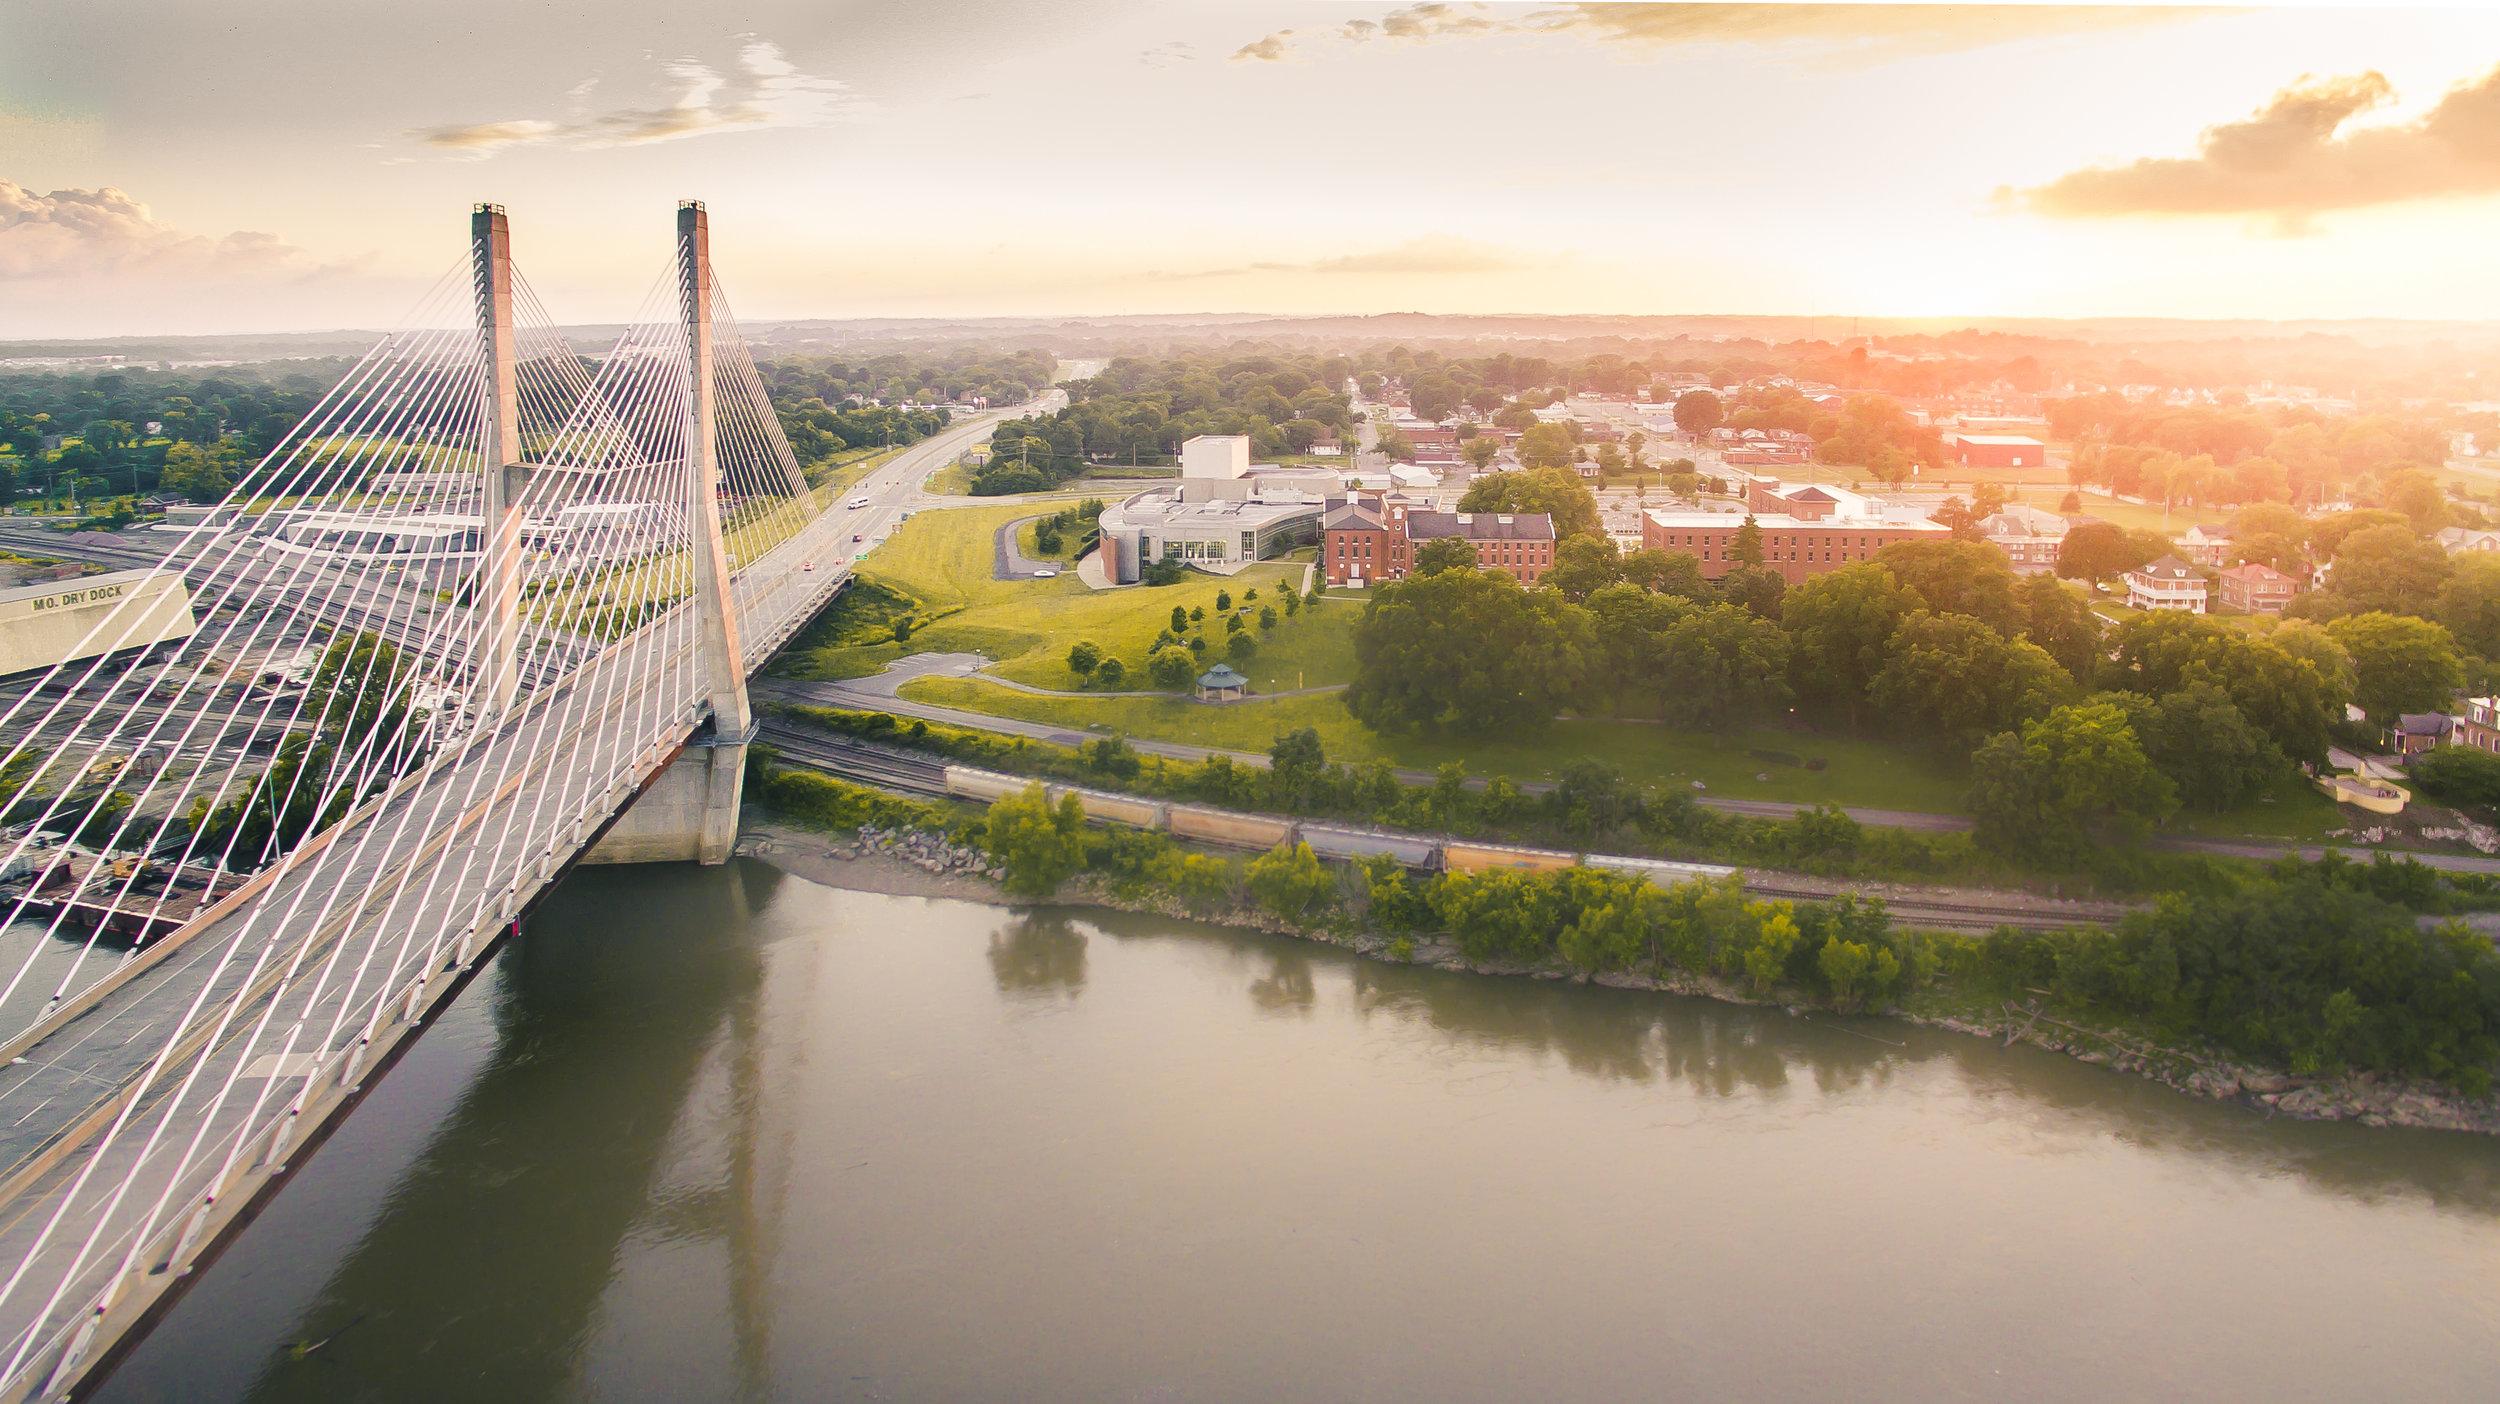 real-estate-photography-drone-photographer-drone-greensboro-nc-triad-212 (1).jpg